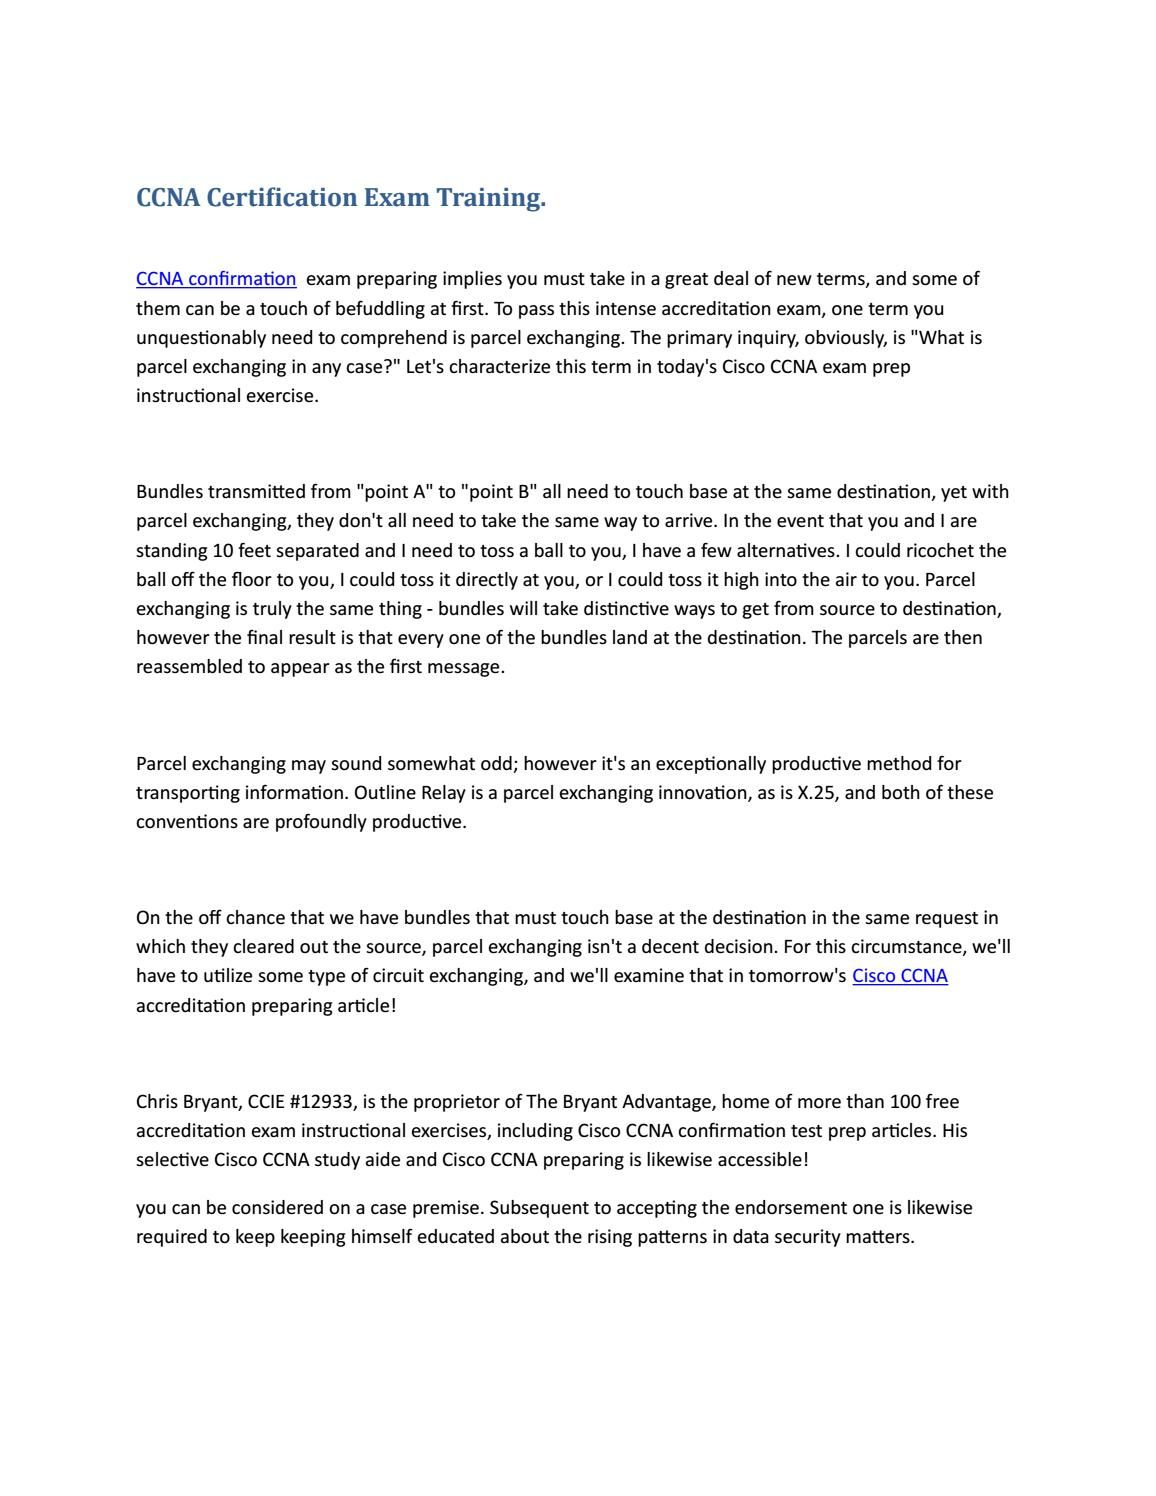 Certification exam training ccna certification exam training 1betcityfo Gallery